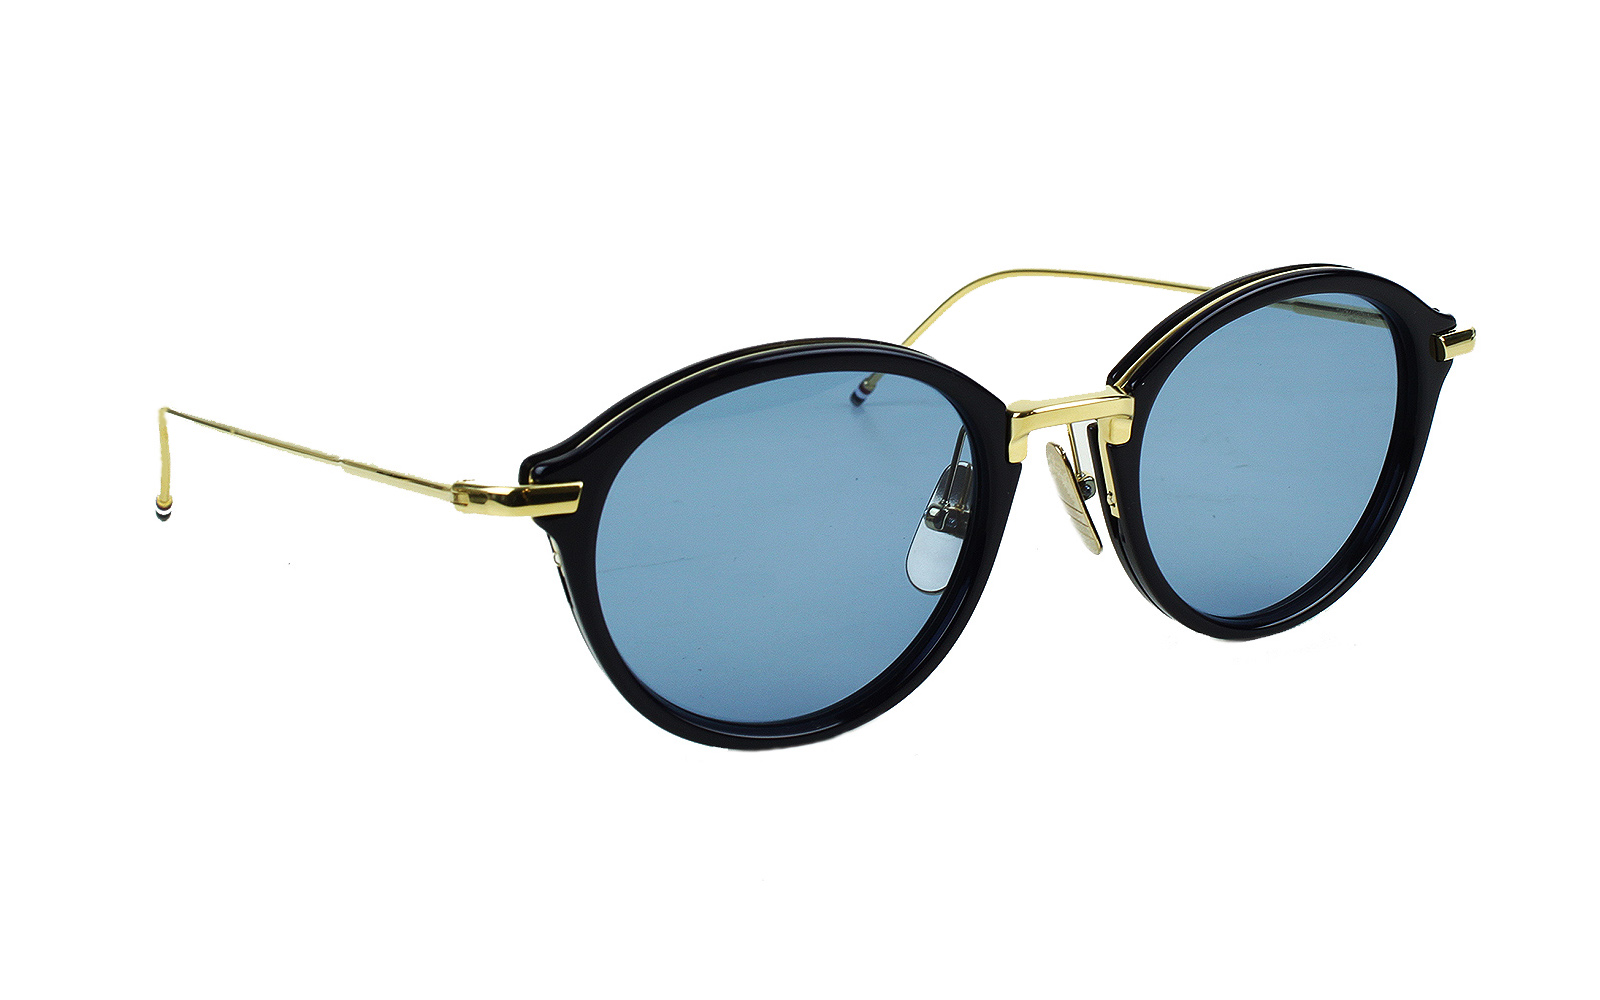 4dae27039ea8 Thom Browne TB 011F Sunglasses